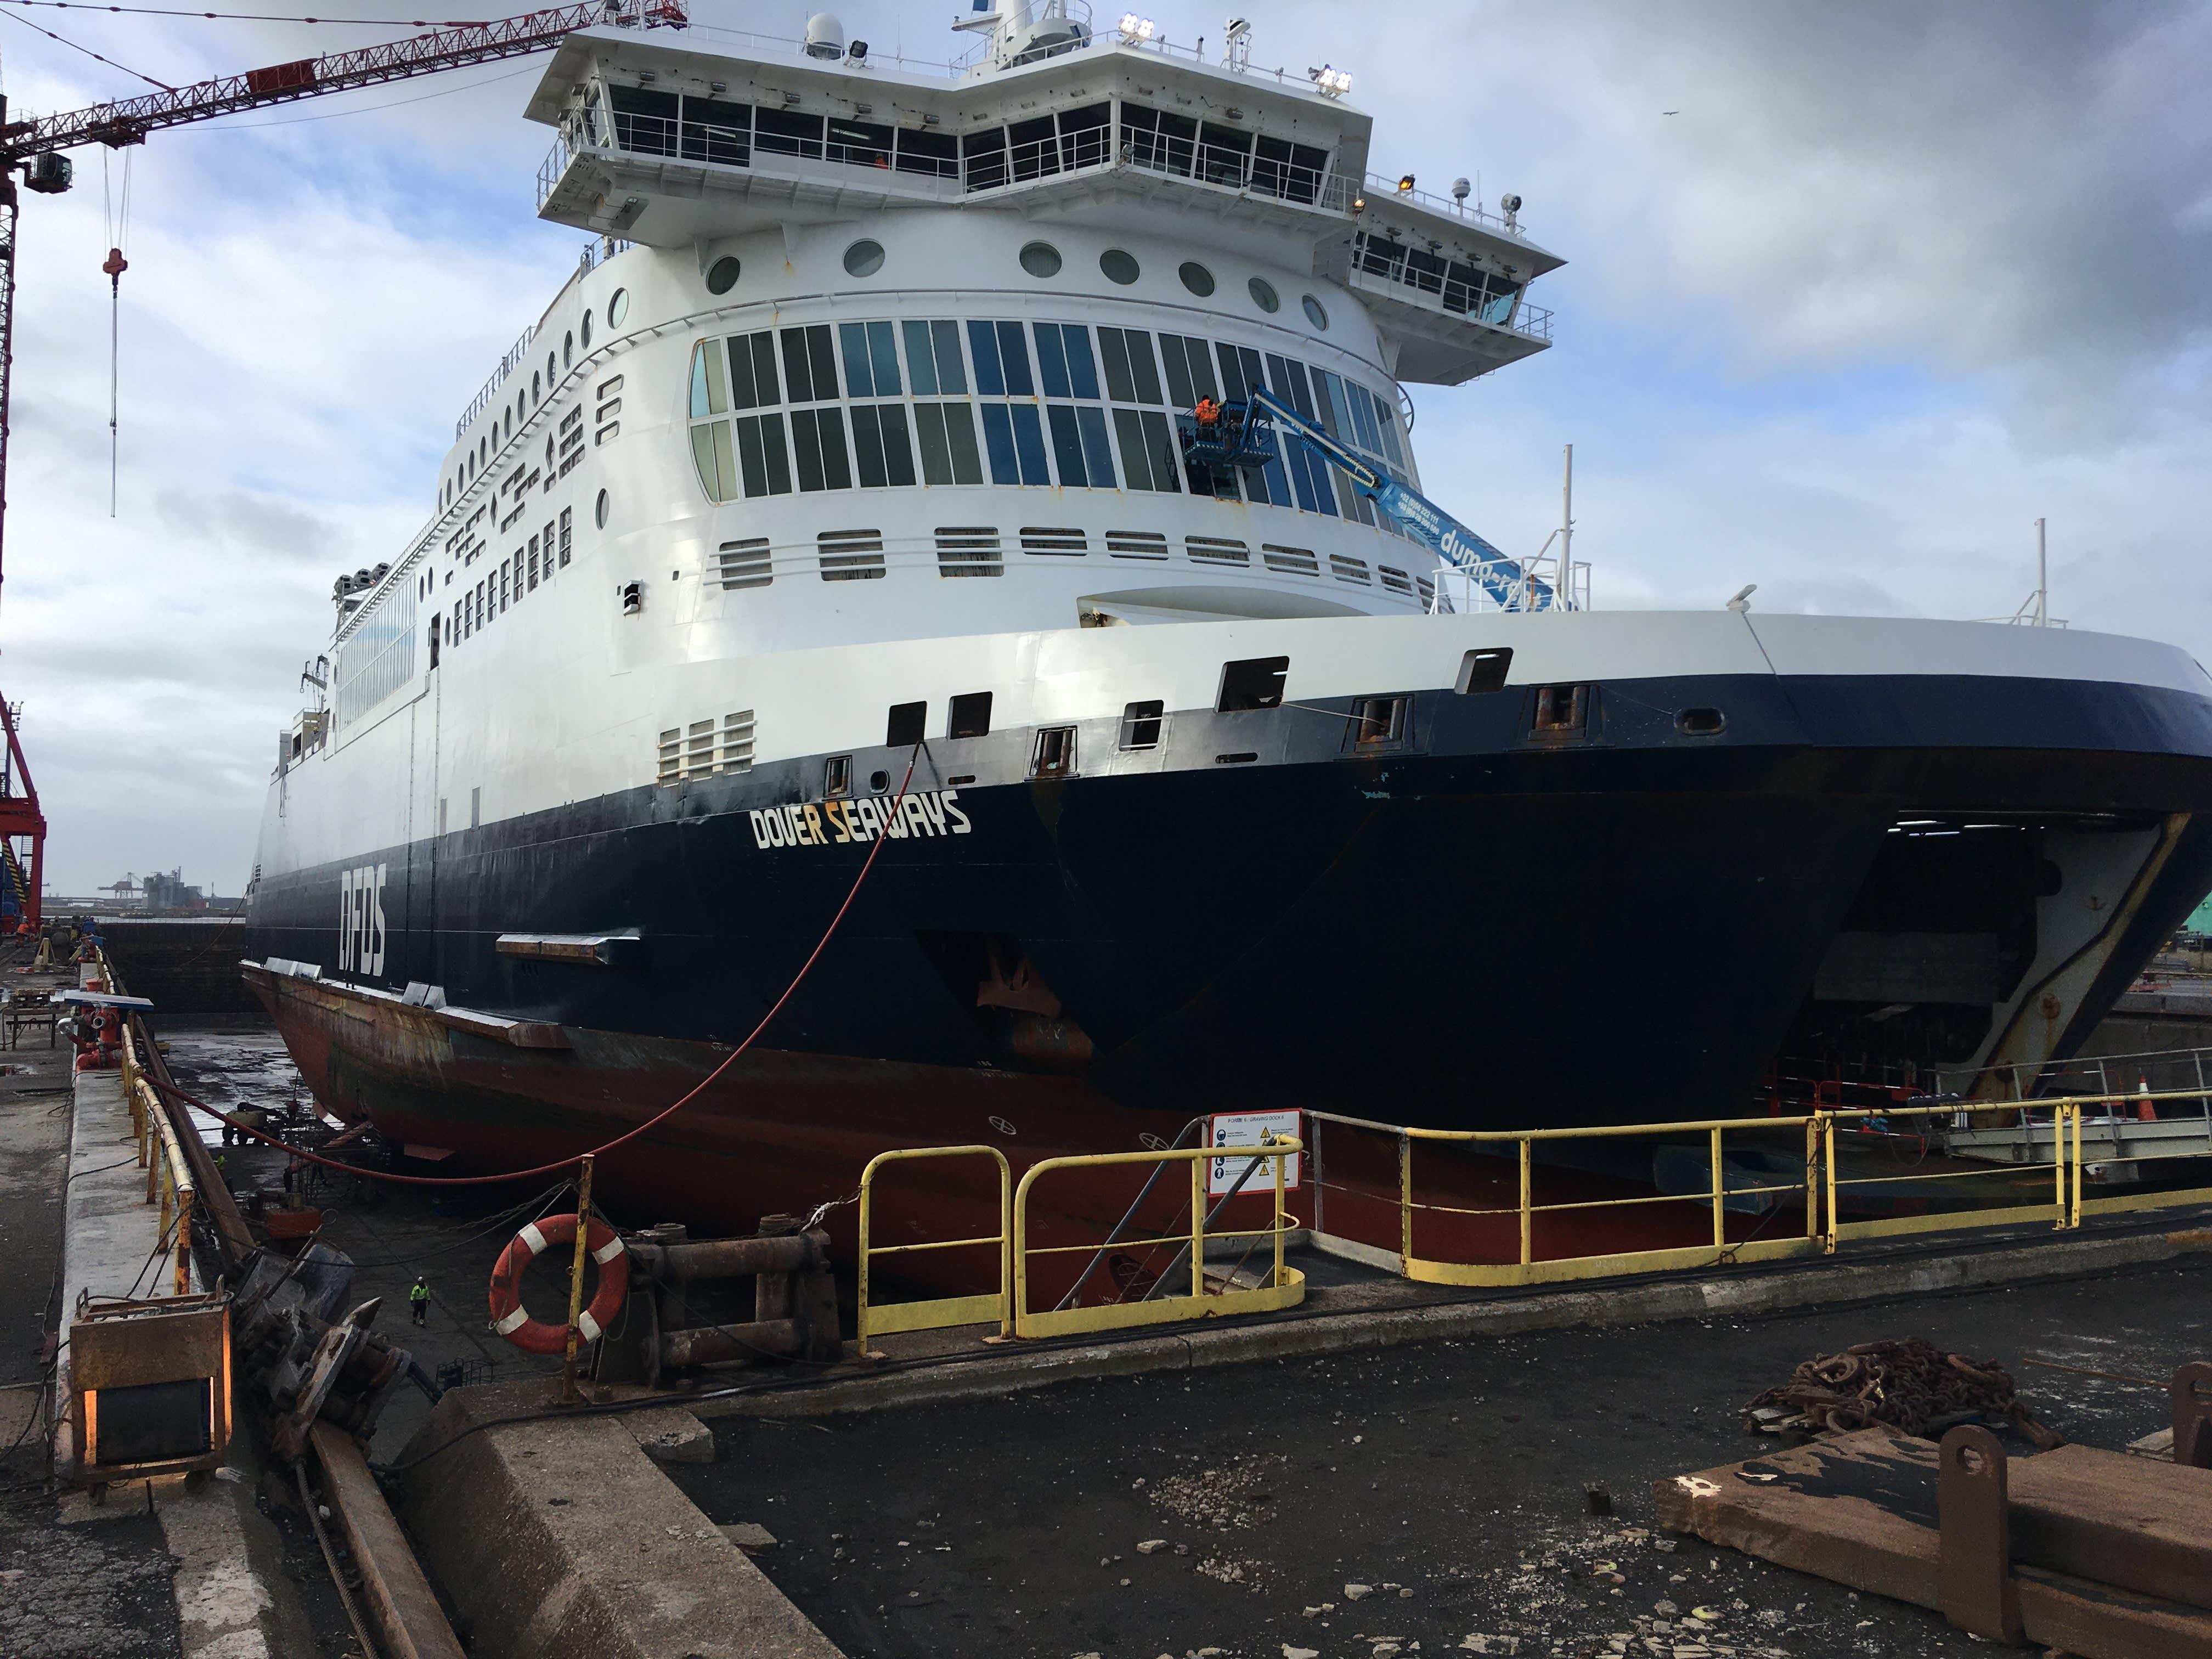 Dover Seaways in dry dock in Dunkerque during upgrade